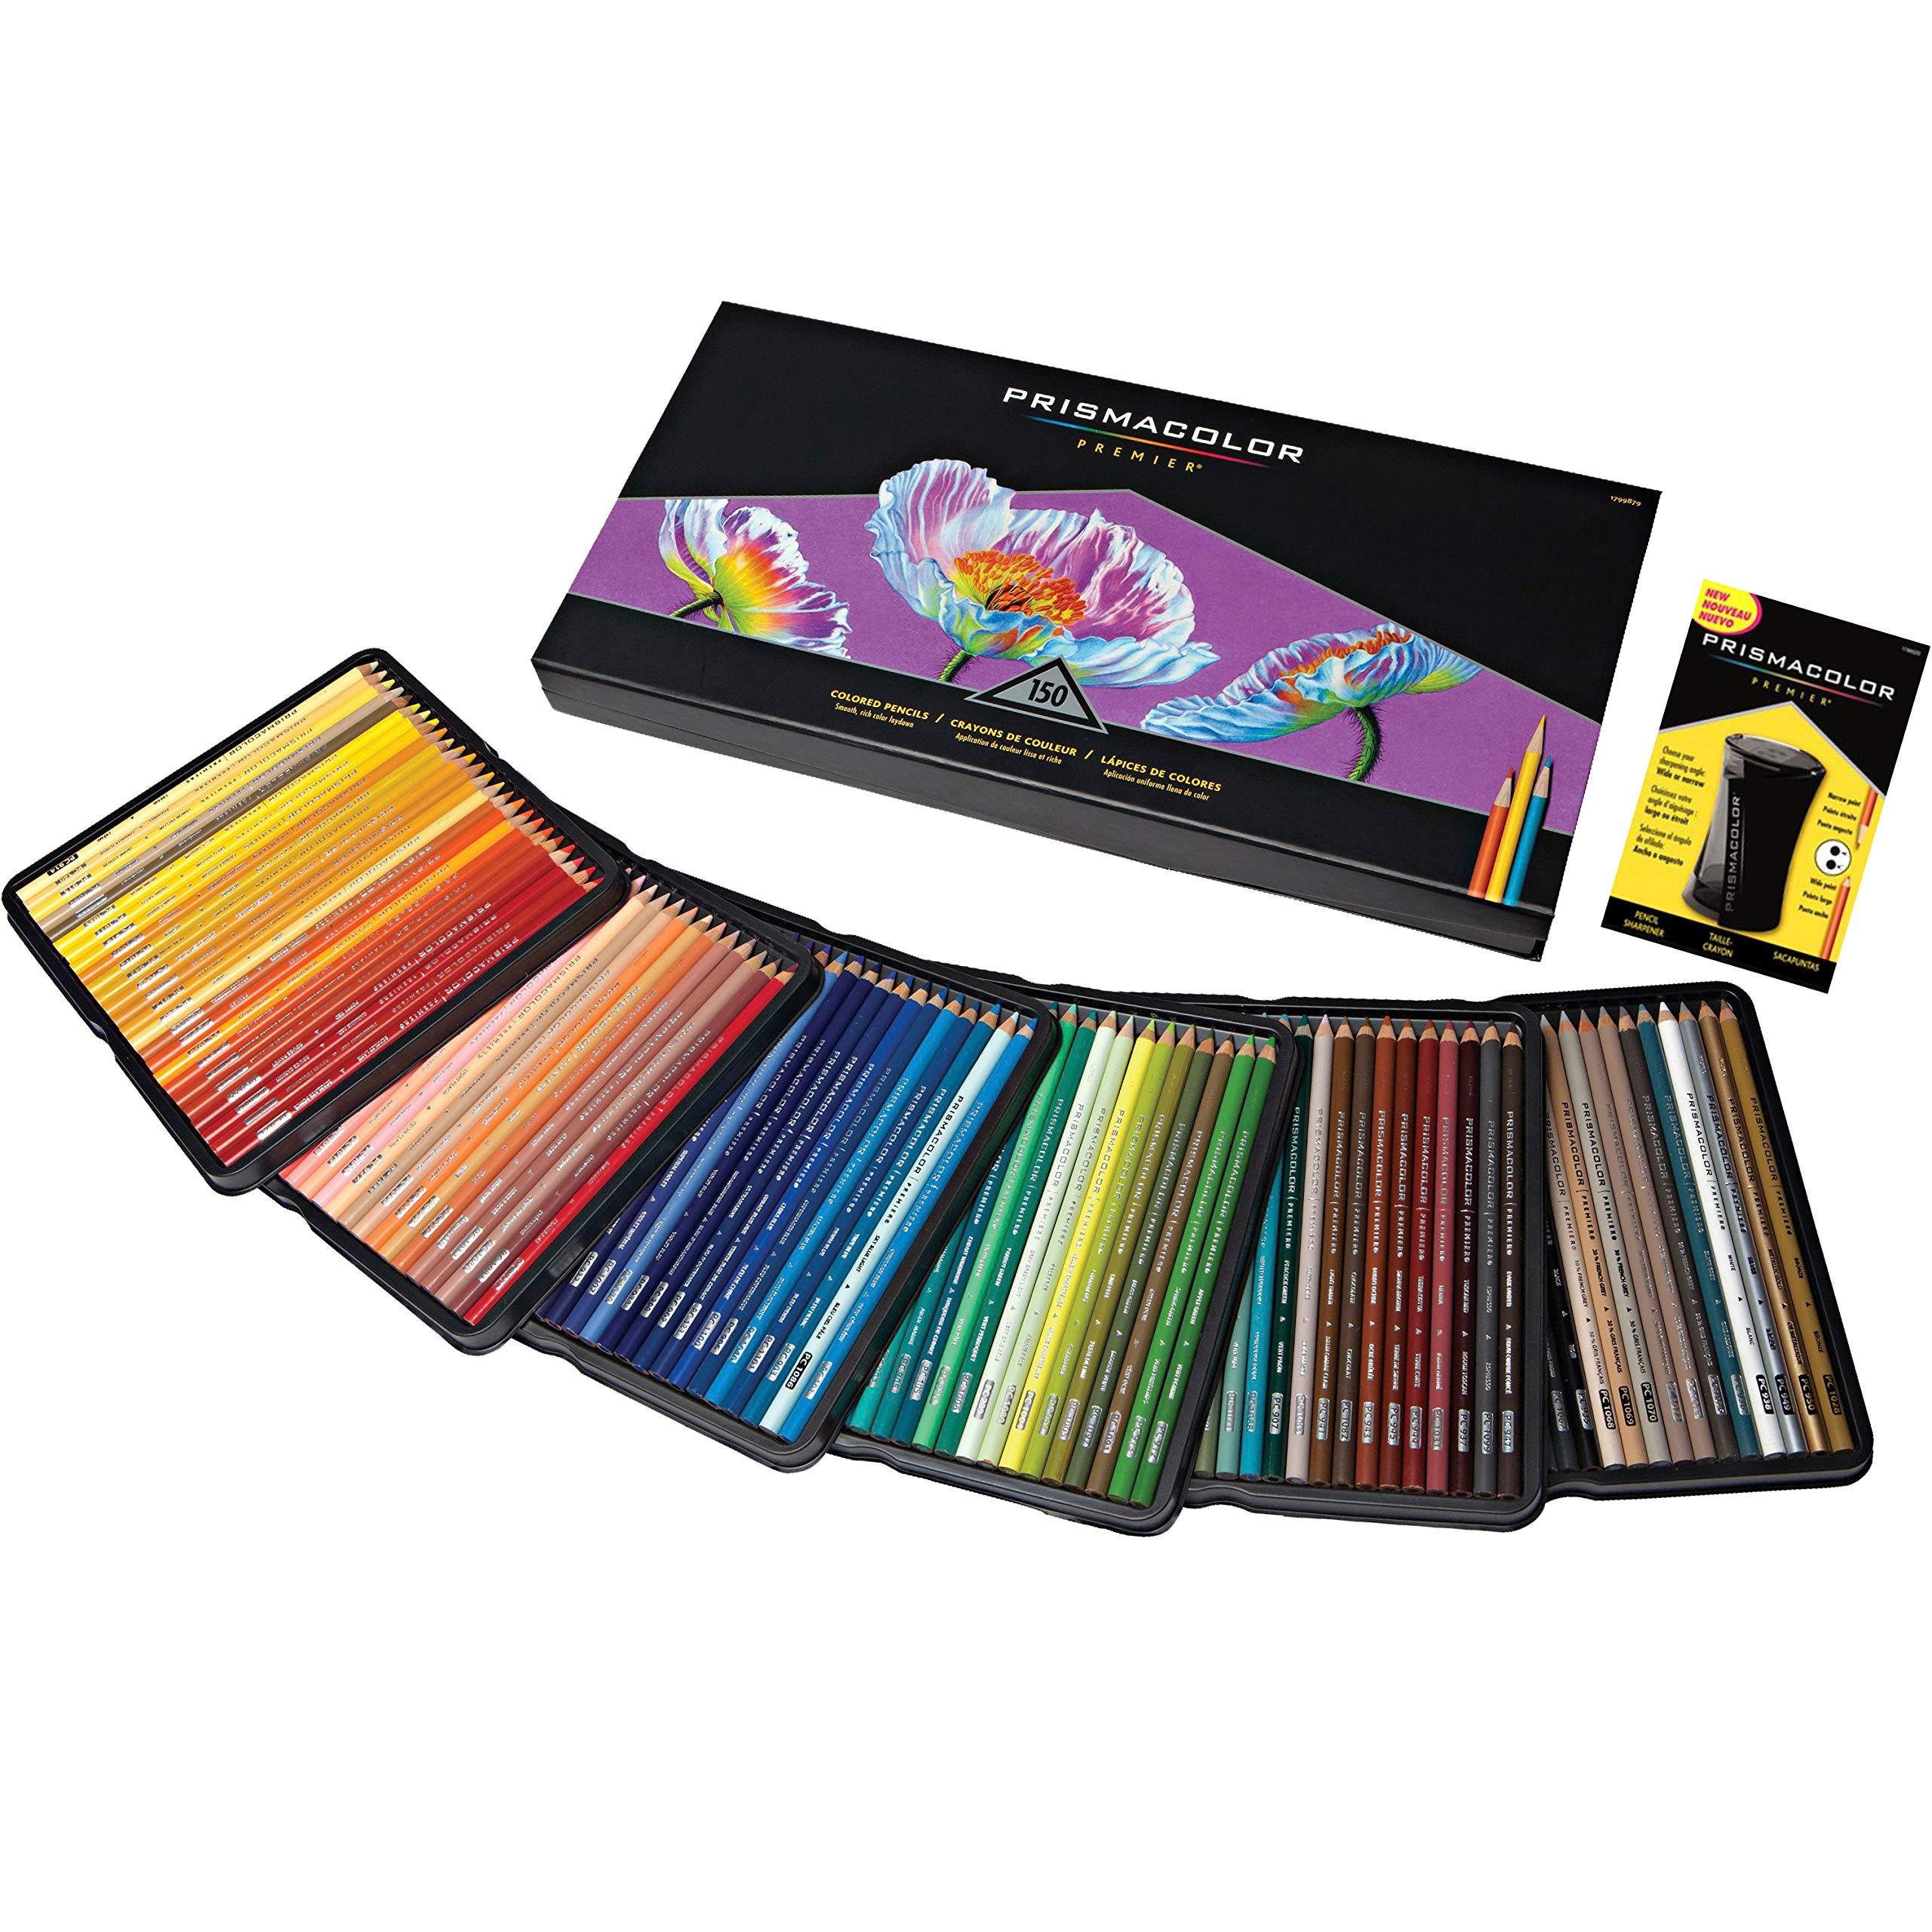 Prismacolor Premier Soft Core Colored Pencil, Set of 150 Assorted Colors with Pencil Sharpener by PRISMACOLOR